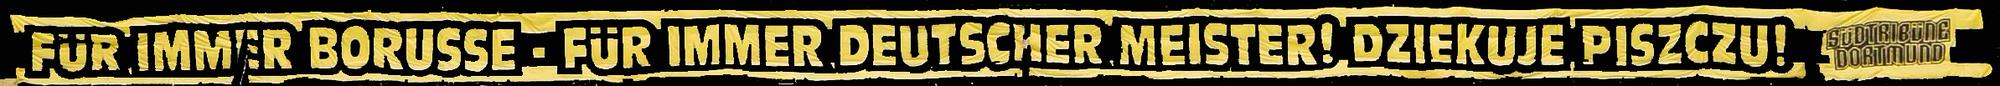 Saison Rückblick 20/21